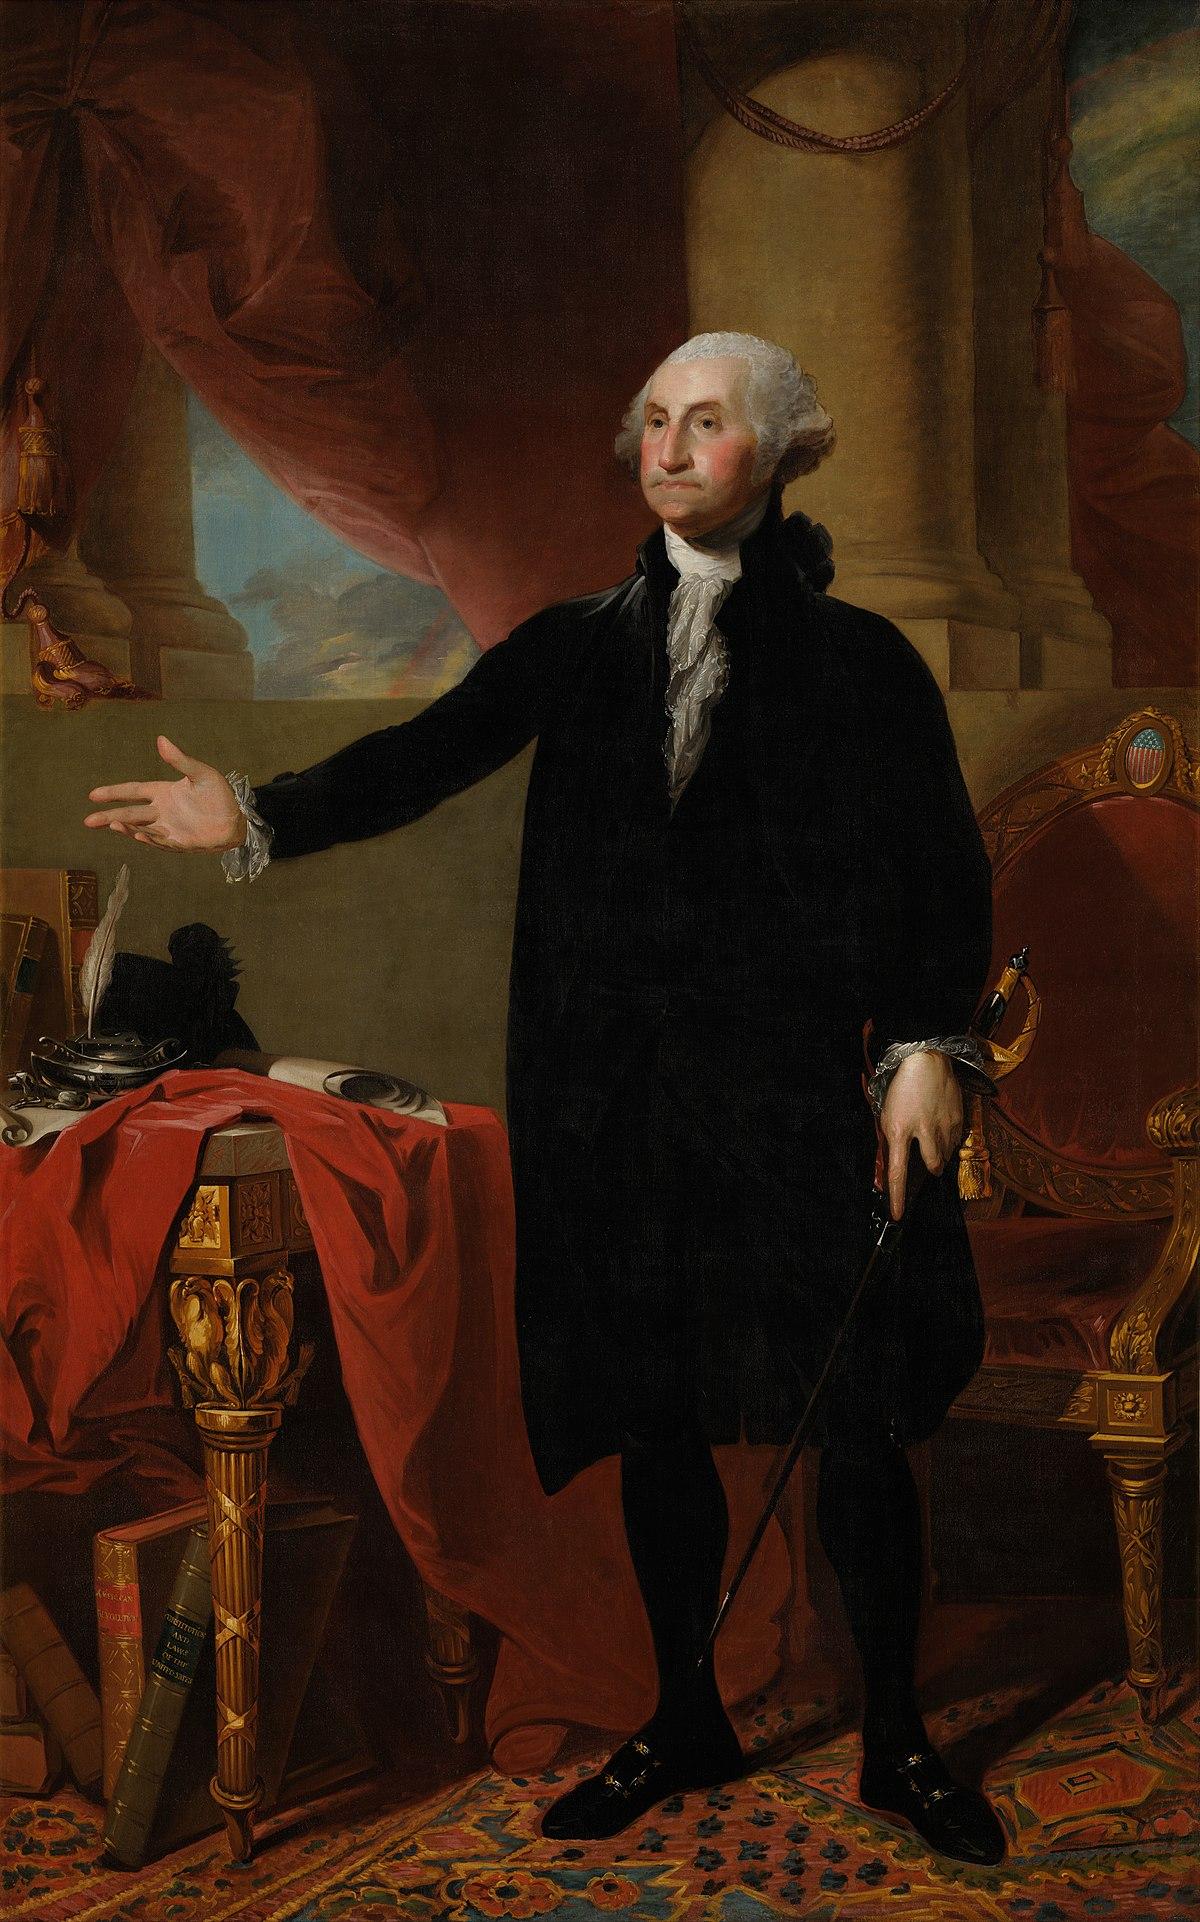 Gilbert Stuart, George Washington (Lansdowne portrait of George Washington) , 1796. This is the portrait Dolley Madison saved from the White House in 1814.